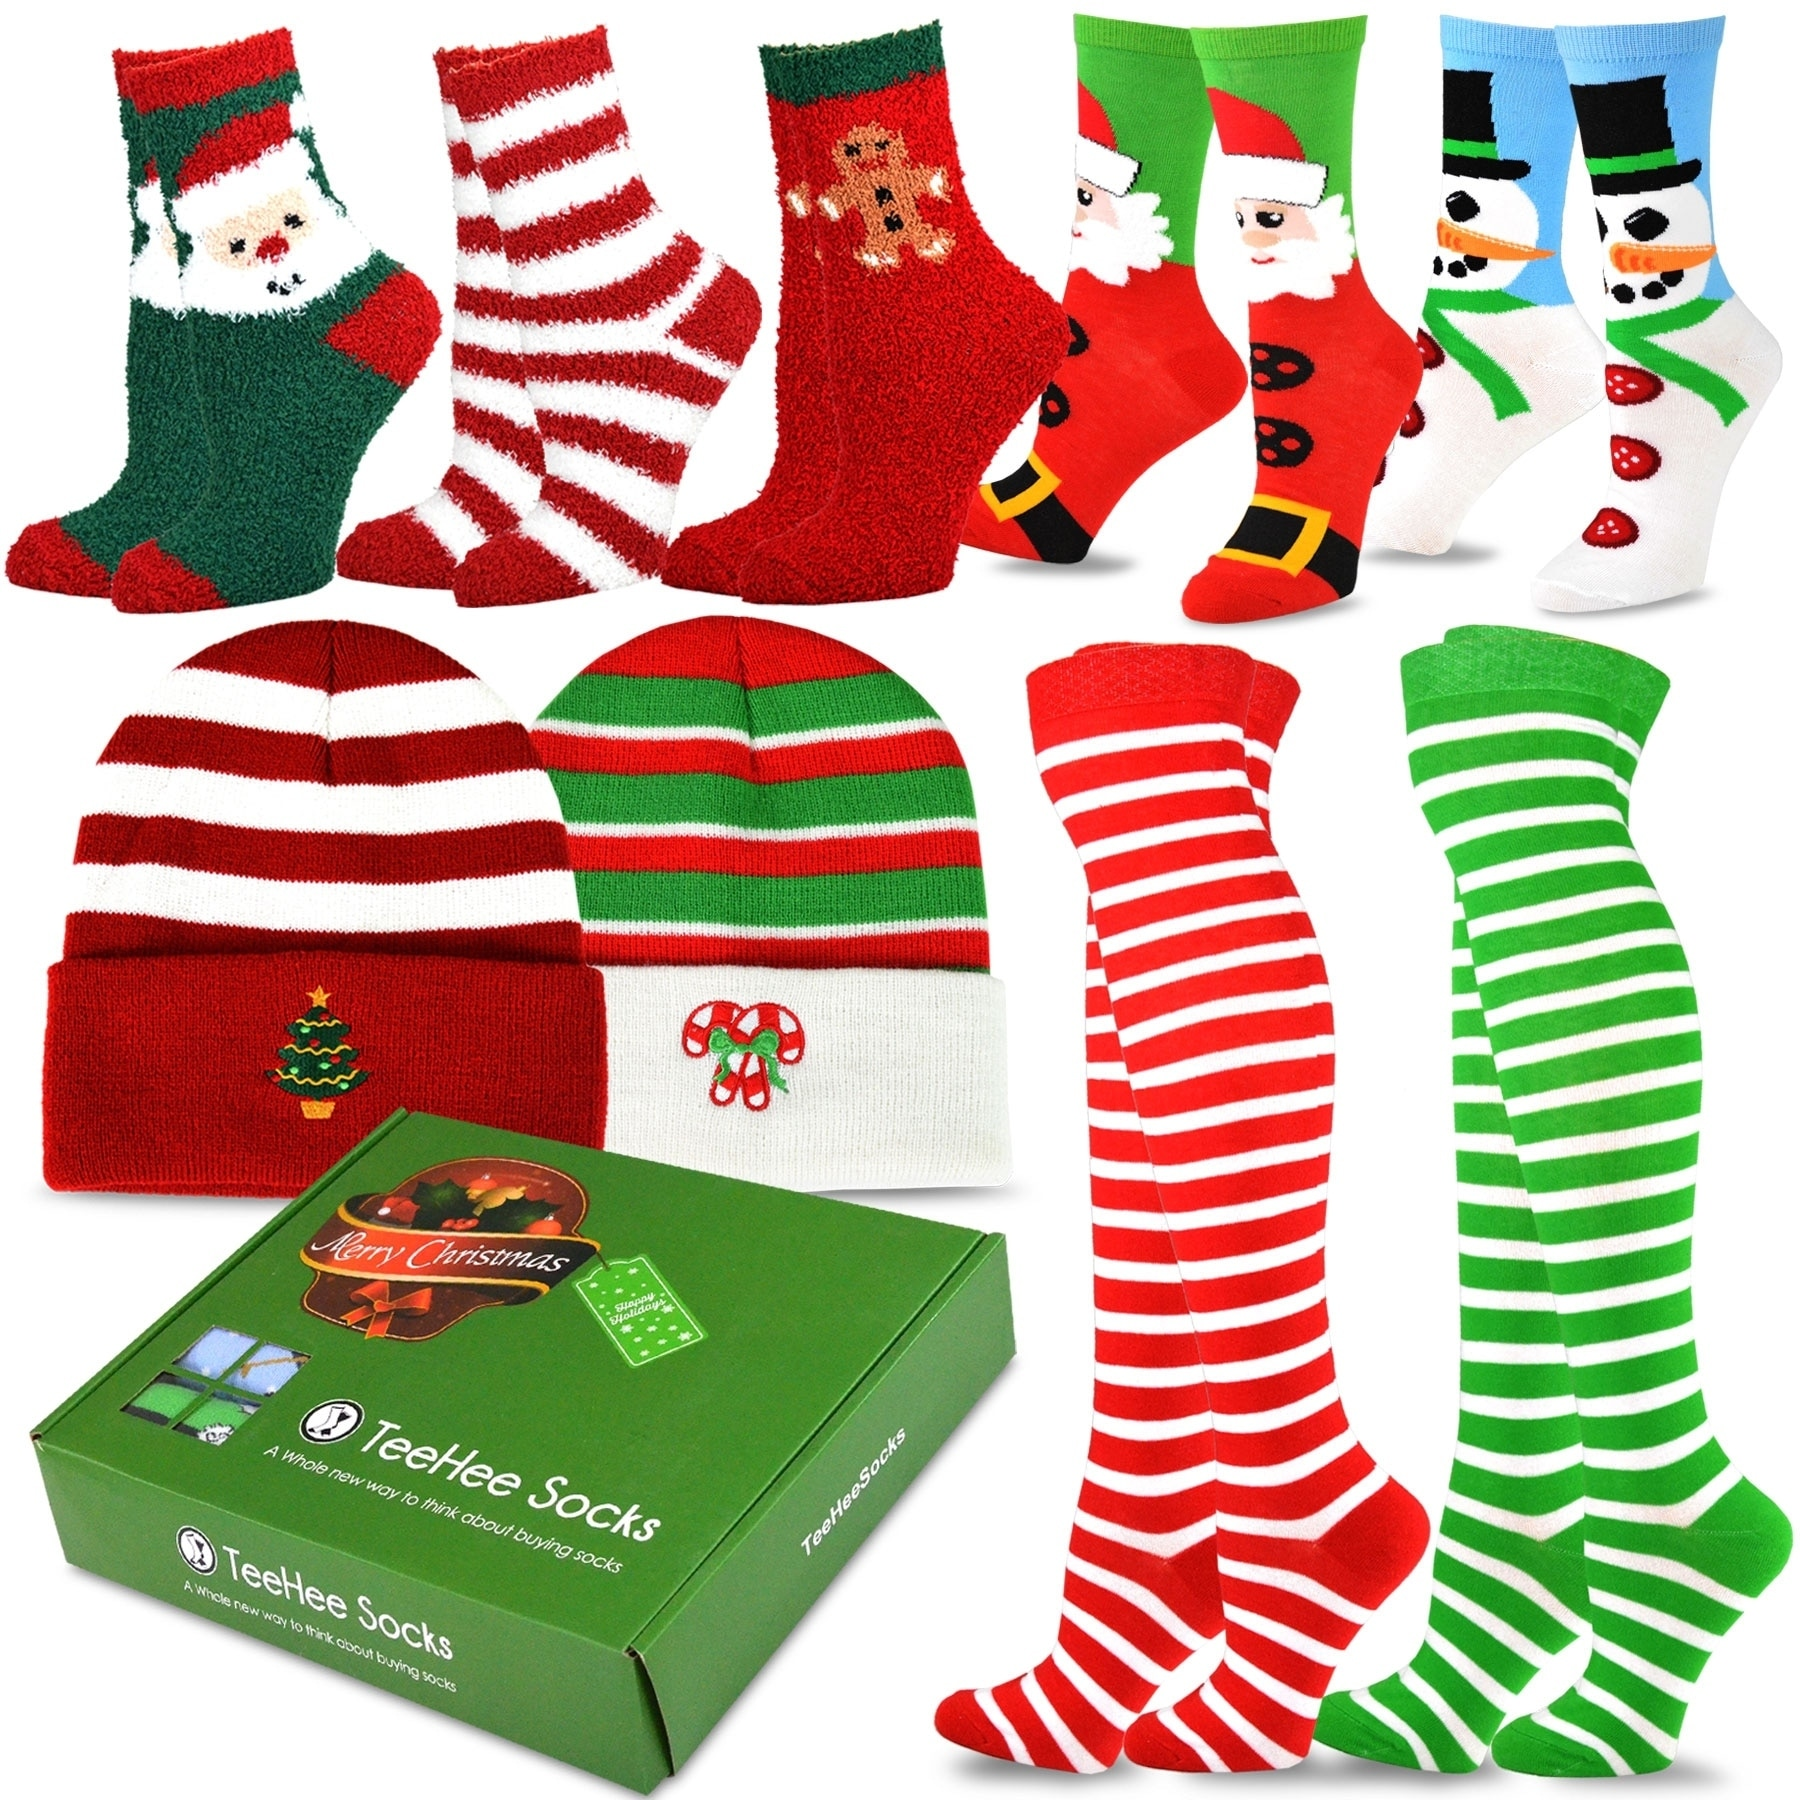 Shop Teehee Christmas Holiday Fun Knee High Socks 9 Pack With Gift Box Christmas Holiday On Sale Overstock 20390295